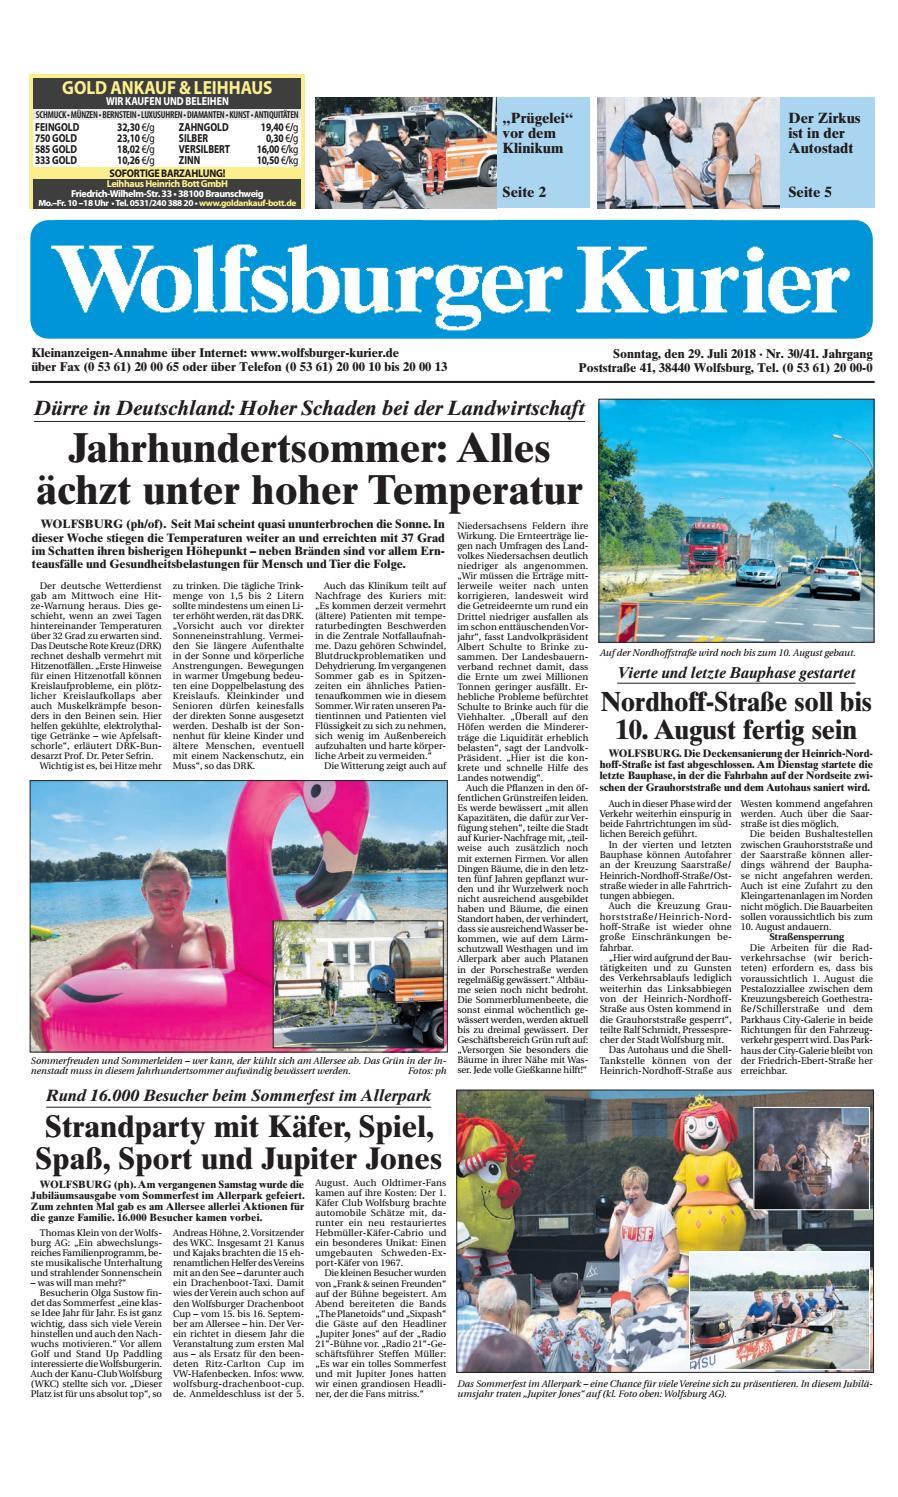 Wolfsburger Kurier by Wolfsburger Kurier - issuu